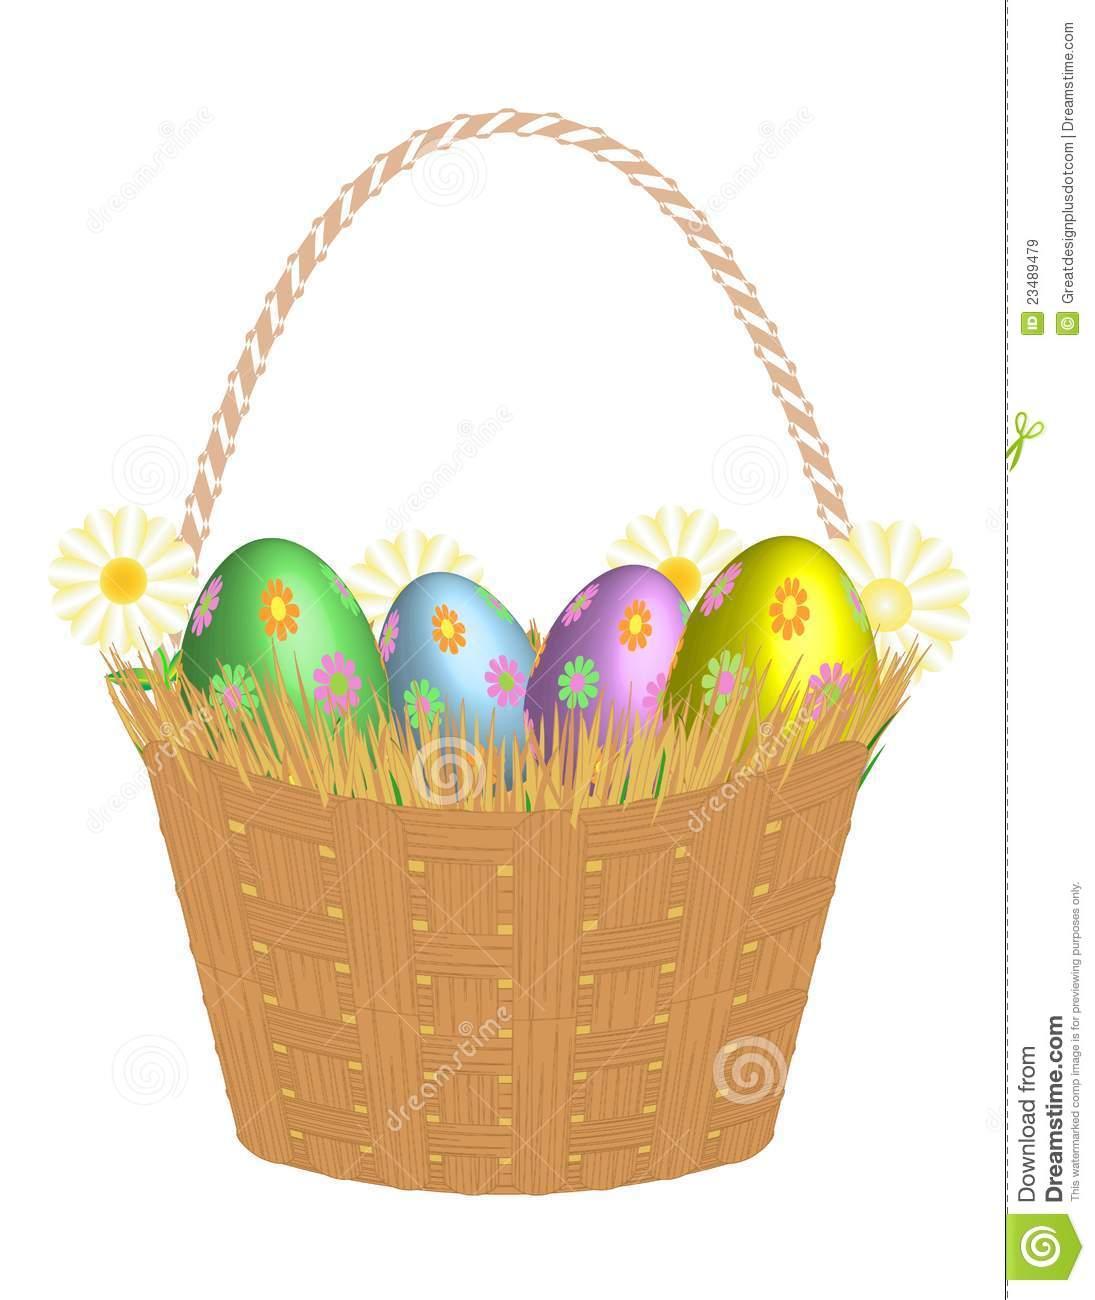 Easter clipart basketball #14